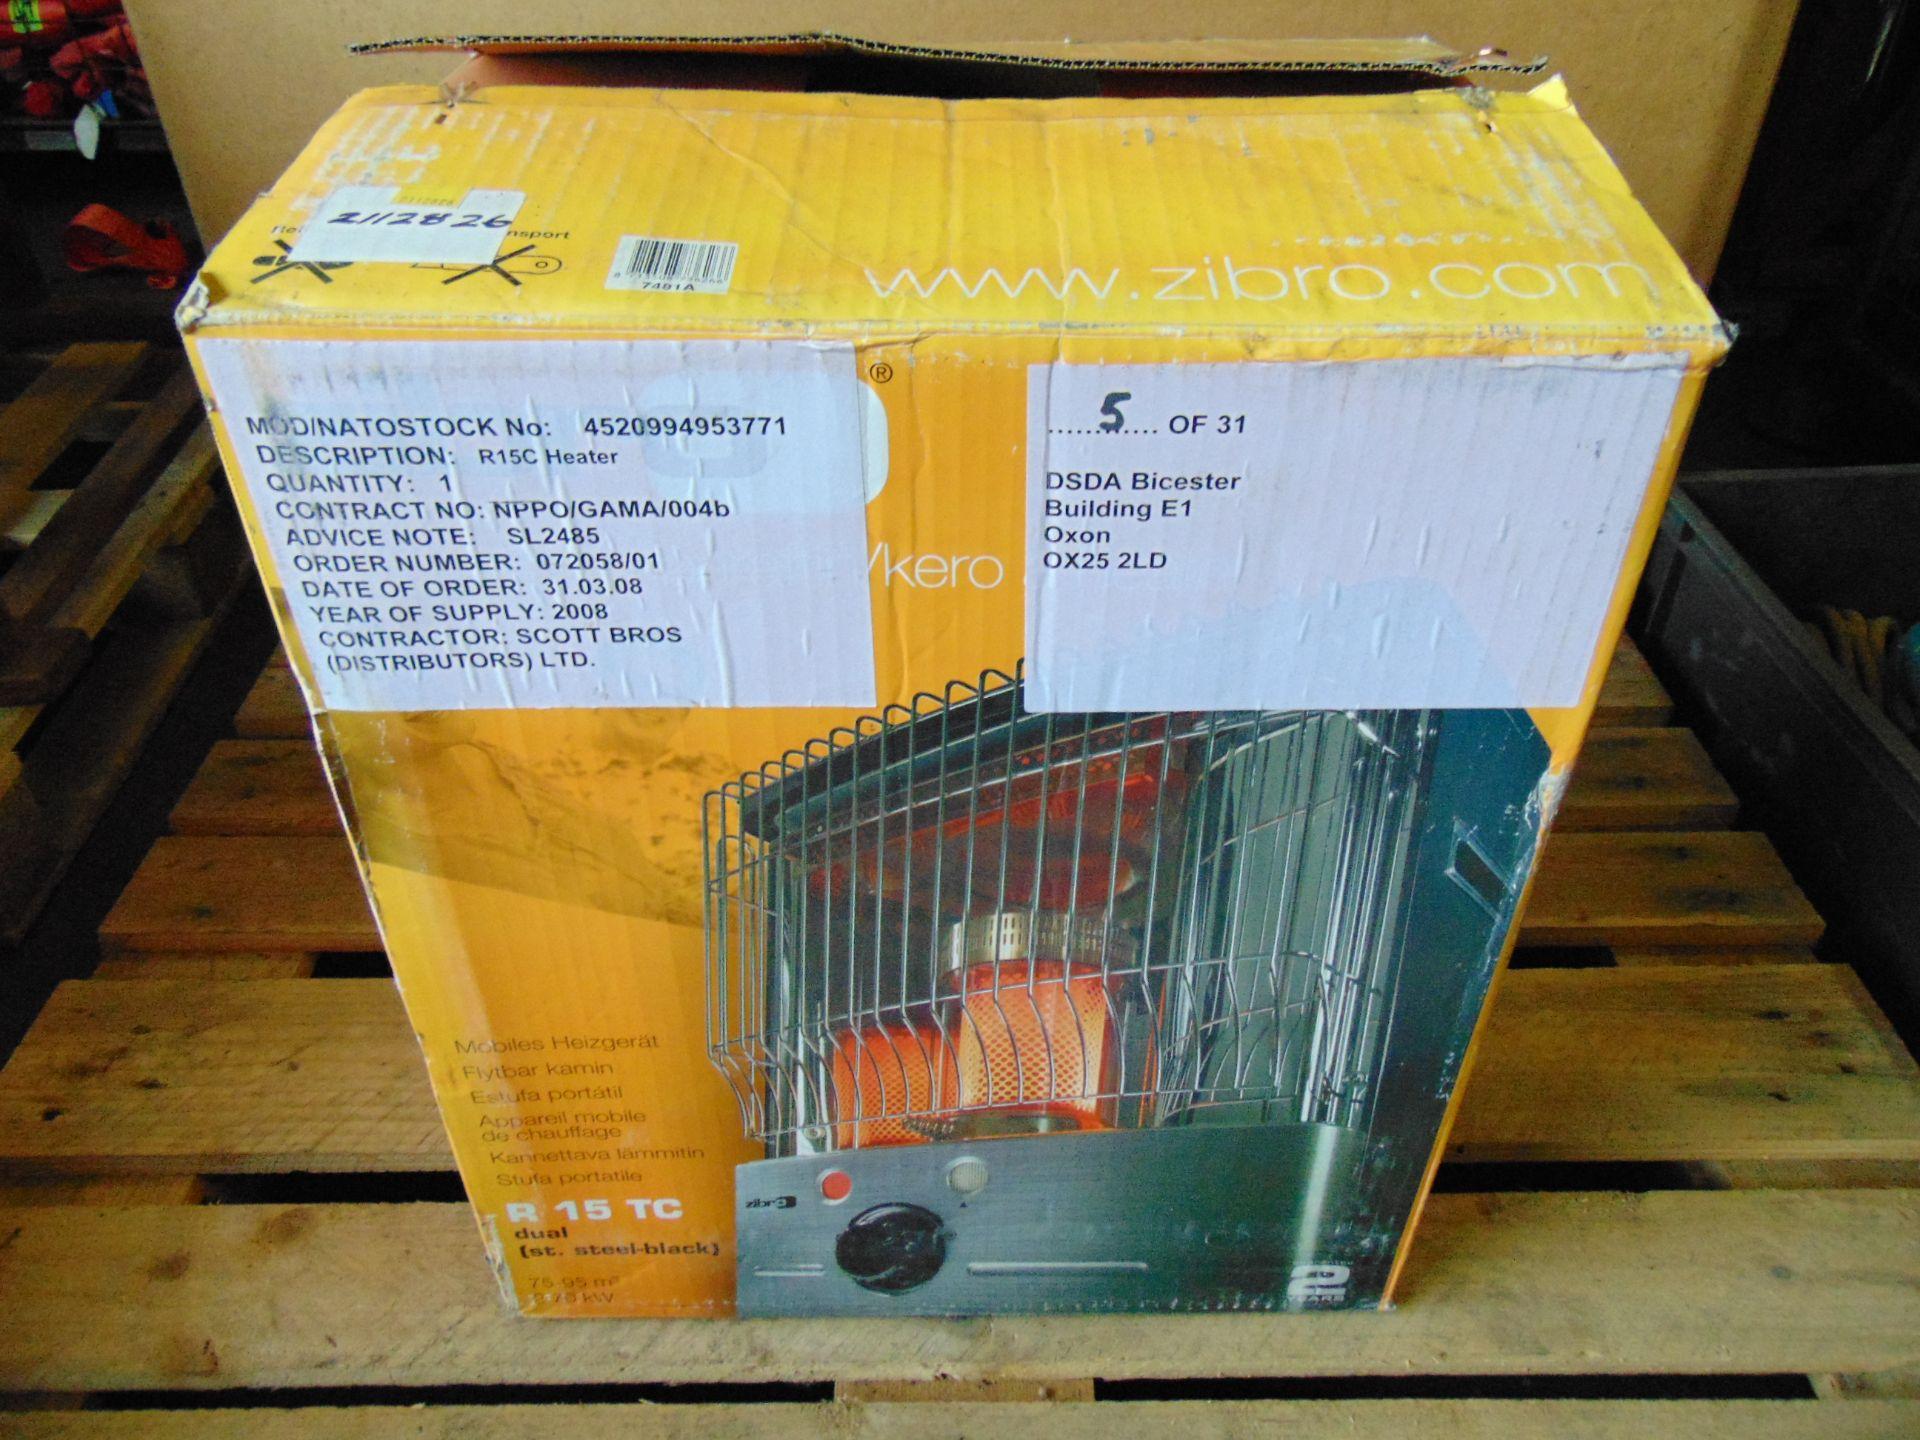 Lot 26846 - Zibro R15 TC Military MoD Portable Paraffin Heater Workshop, Shed, Garage, Greenhouse